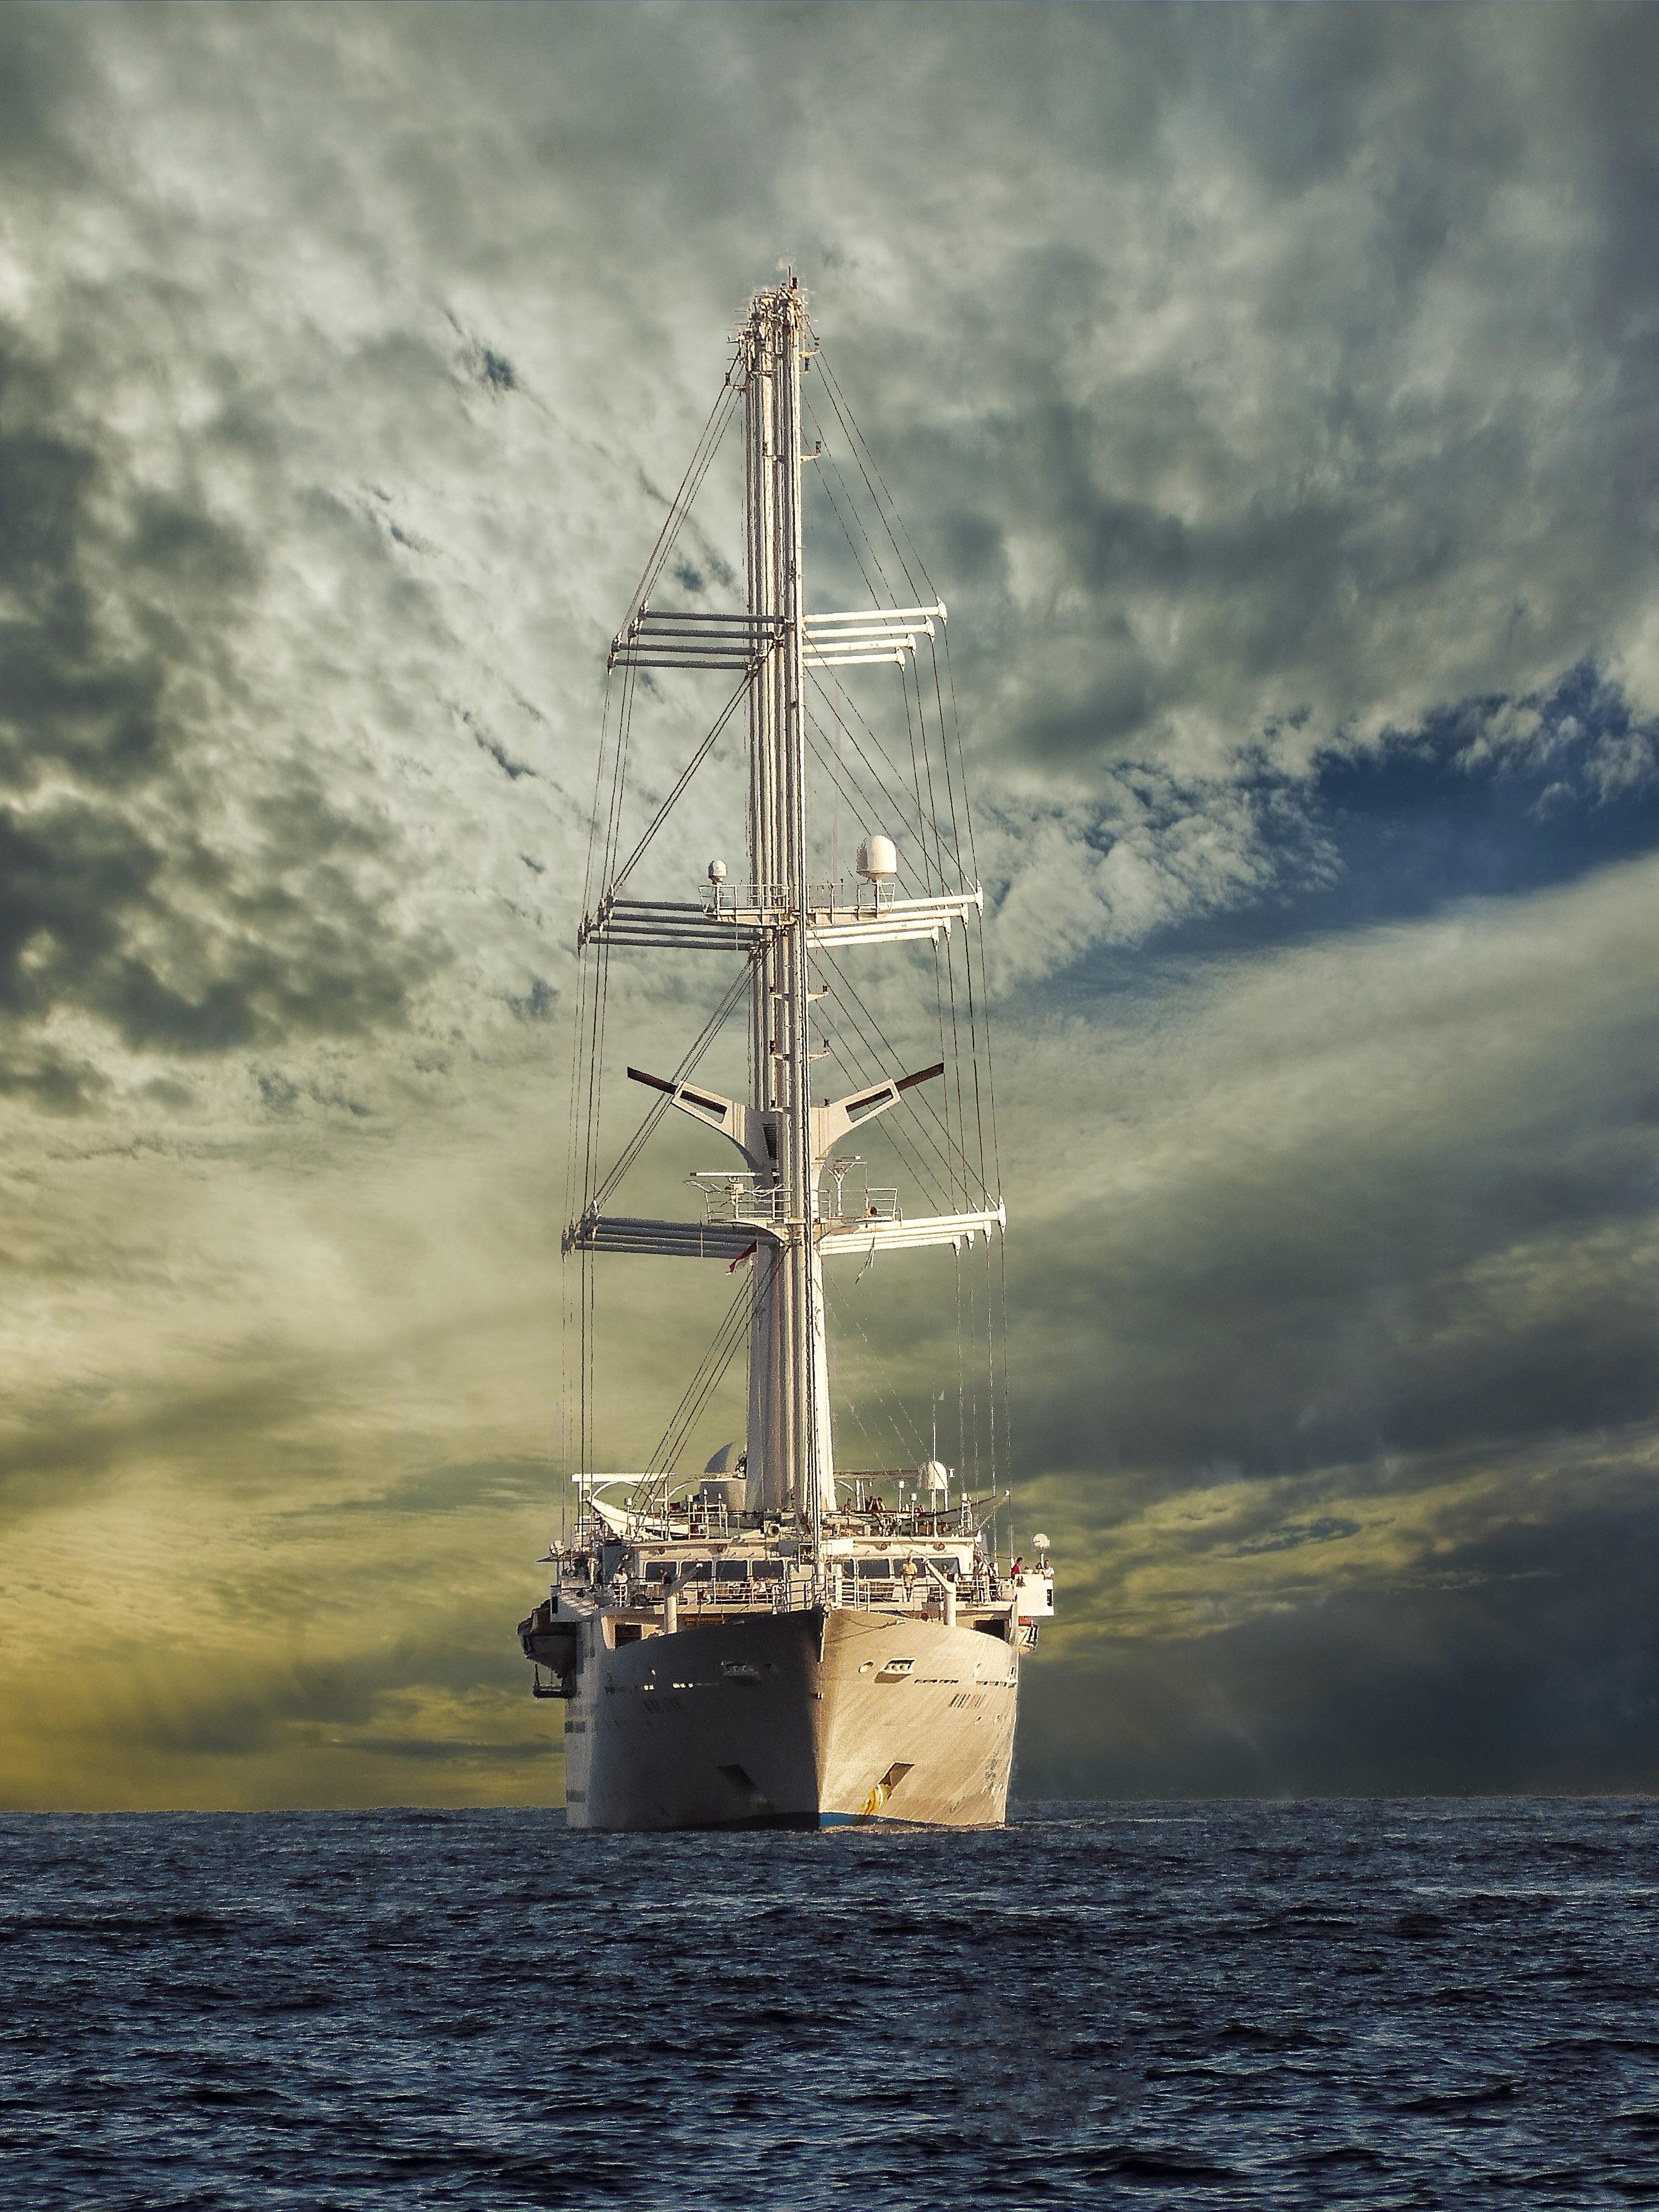 Beautiful Iphone 5 Wallpapers Free Stock Photo Of Boat Maritime Mast